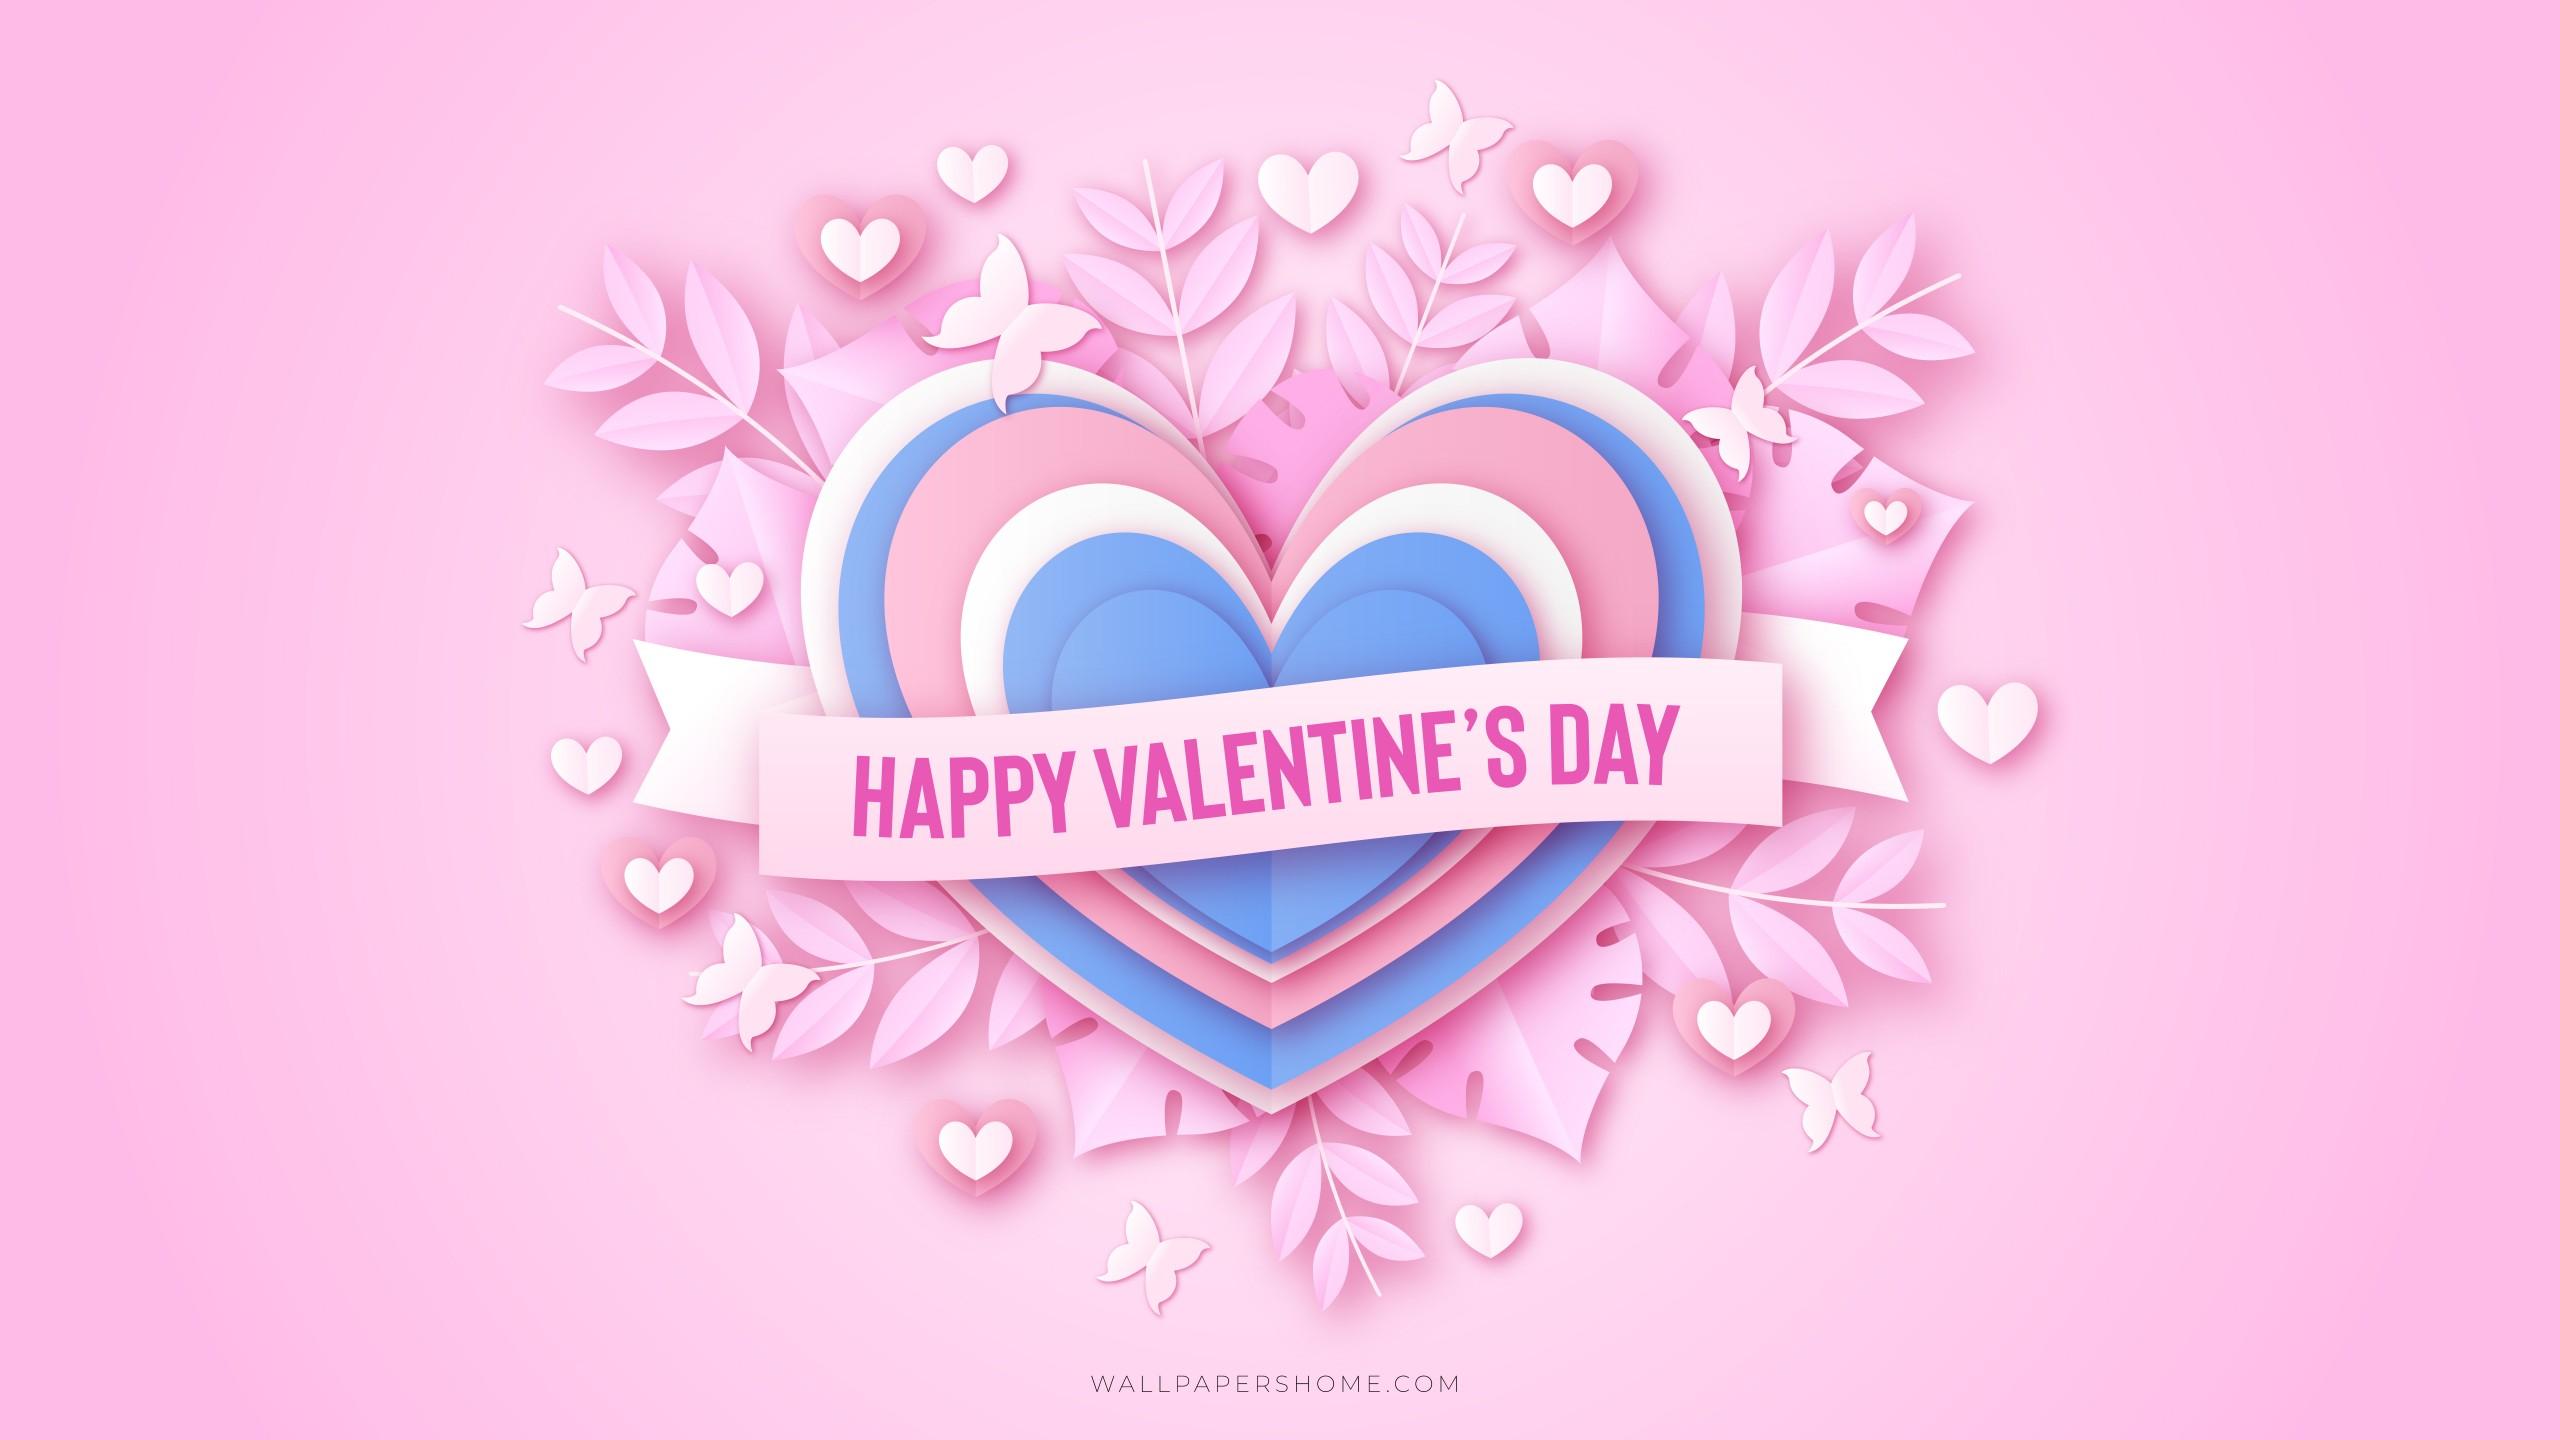 wallpaper valentine s day 2019 love image heart 8k